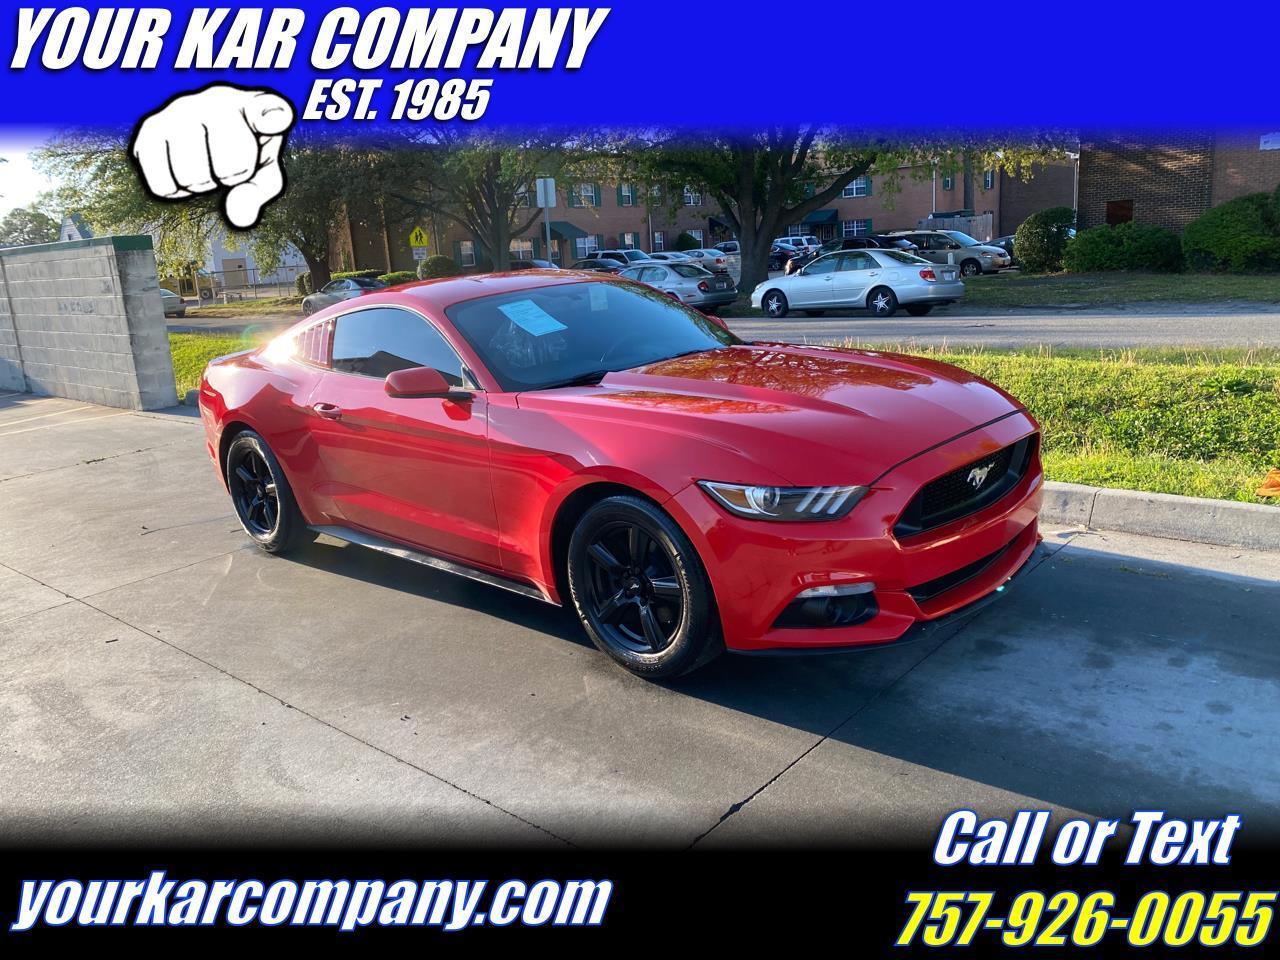 Ford Mustang 2dr Fastback V6 2016